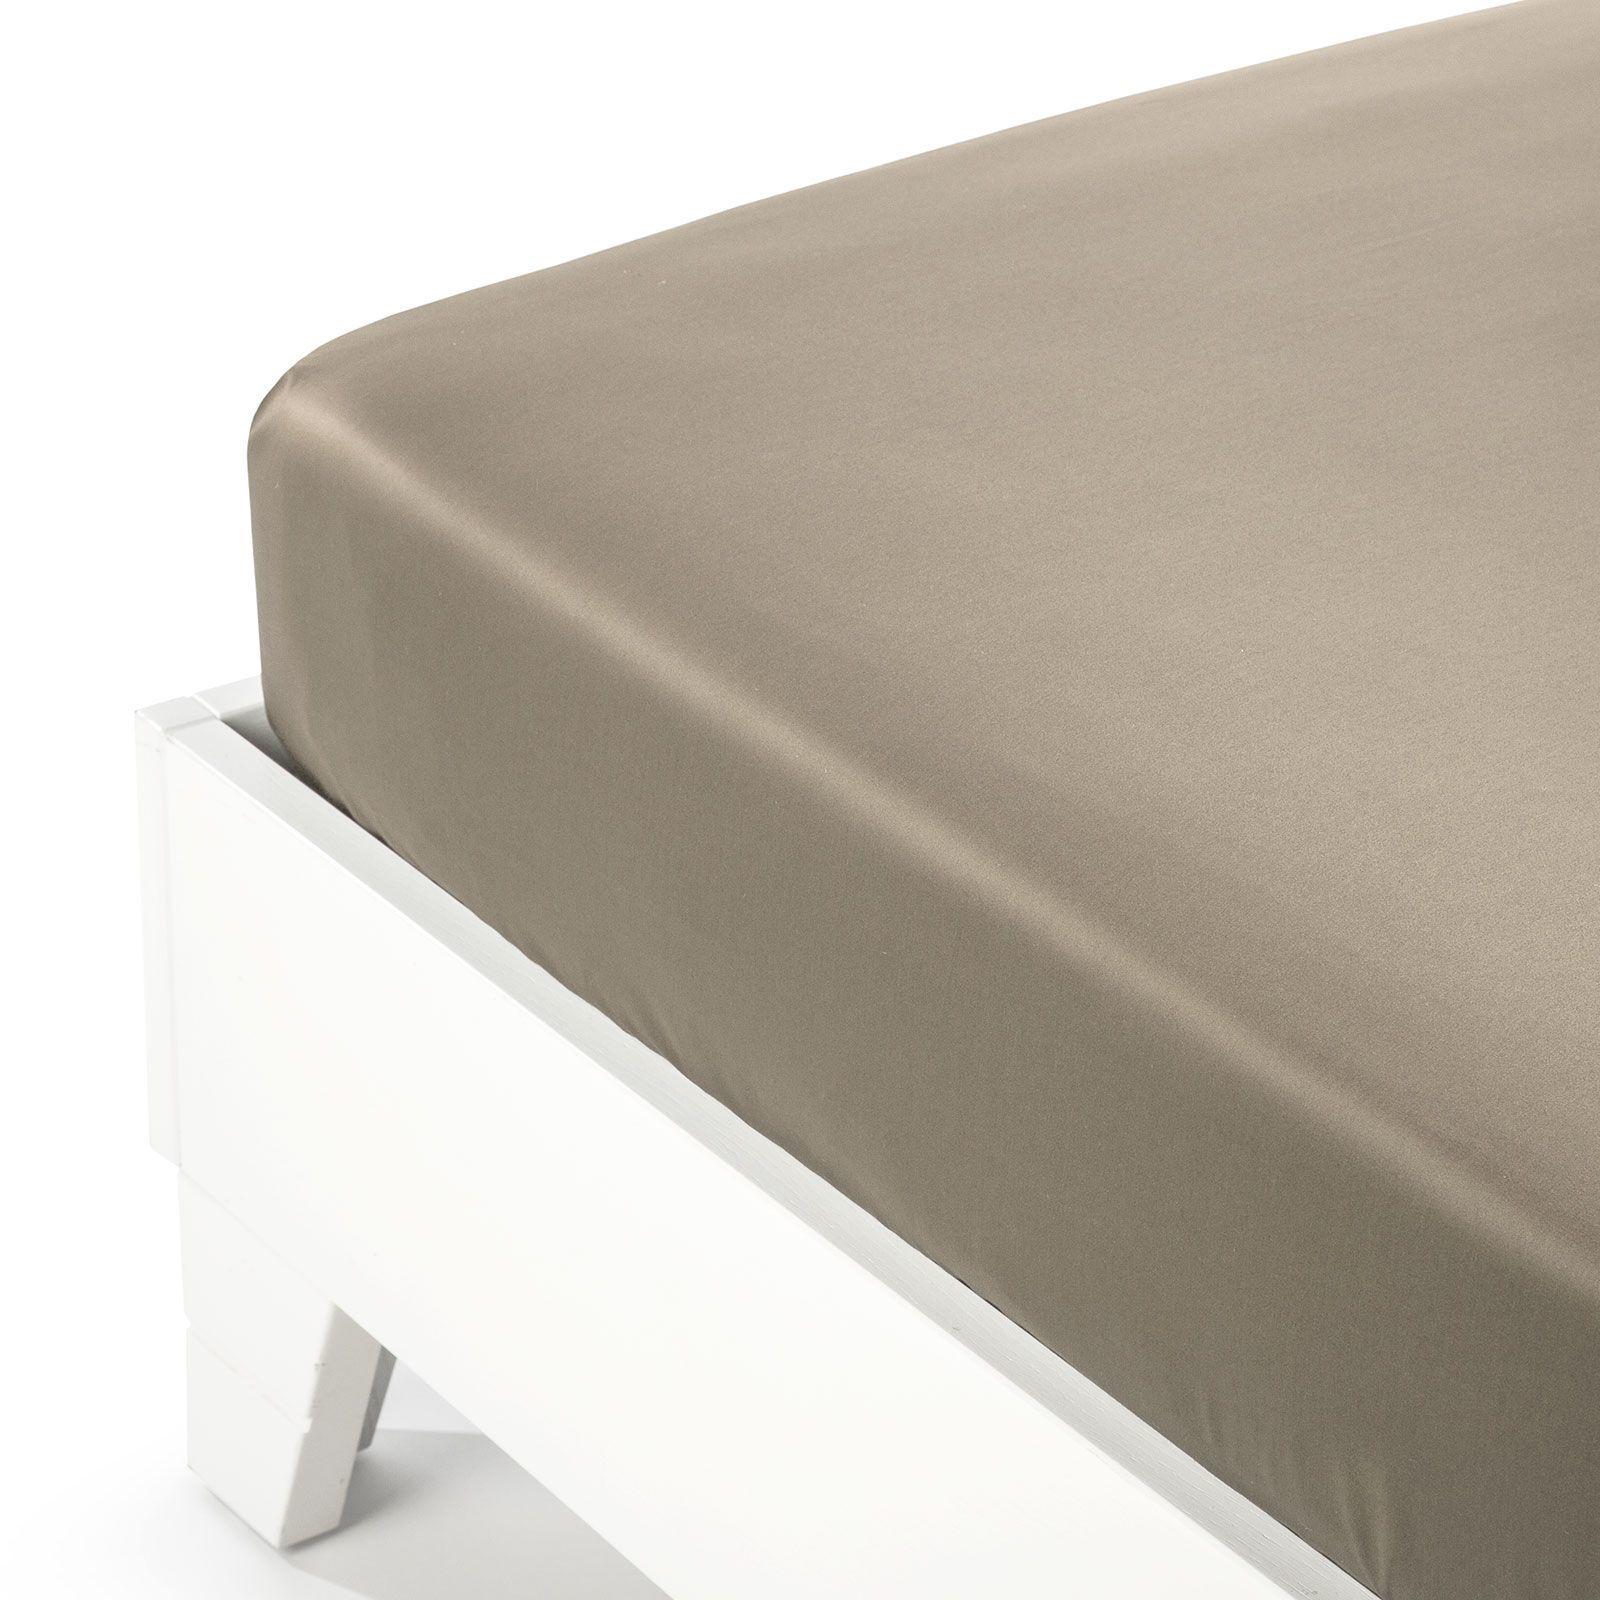 На резинке Простыня на резинке 160x200 Сaleffi Raso Tinta Unito с бордюром сатин серо-коричневая prostynya-na-rezinke-90x200-saleffi-raso-tinta-unito-satin-tortora-italiya.jpg